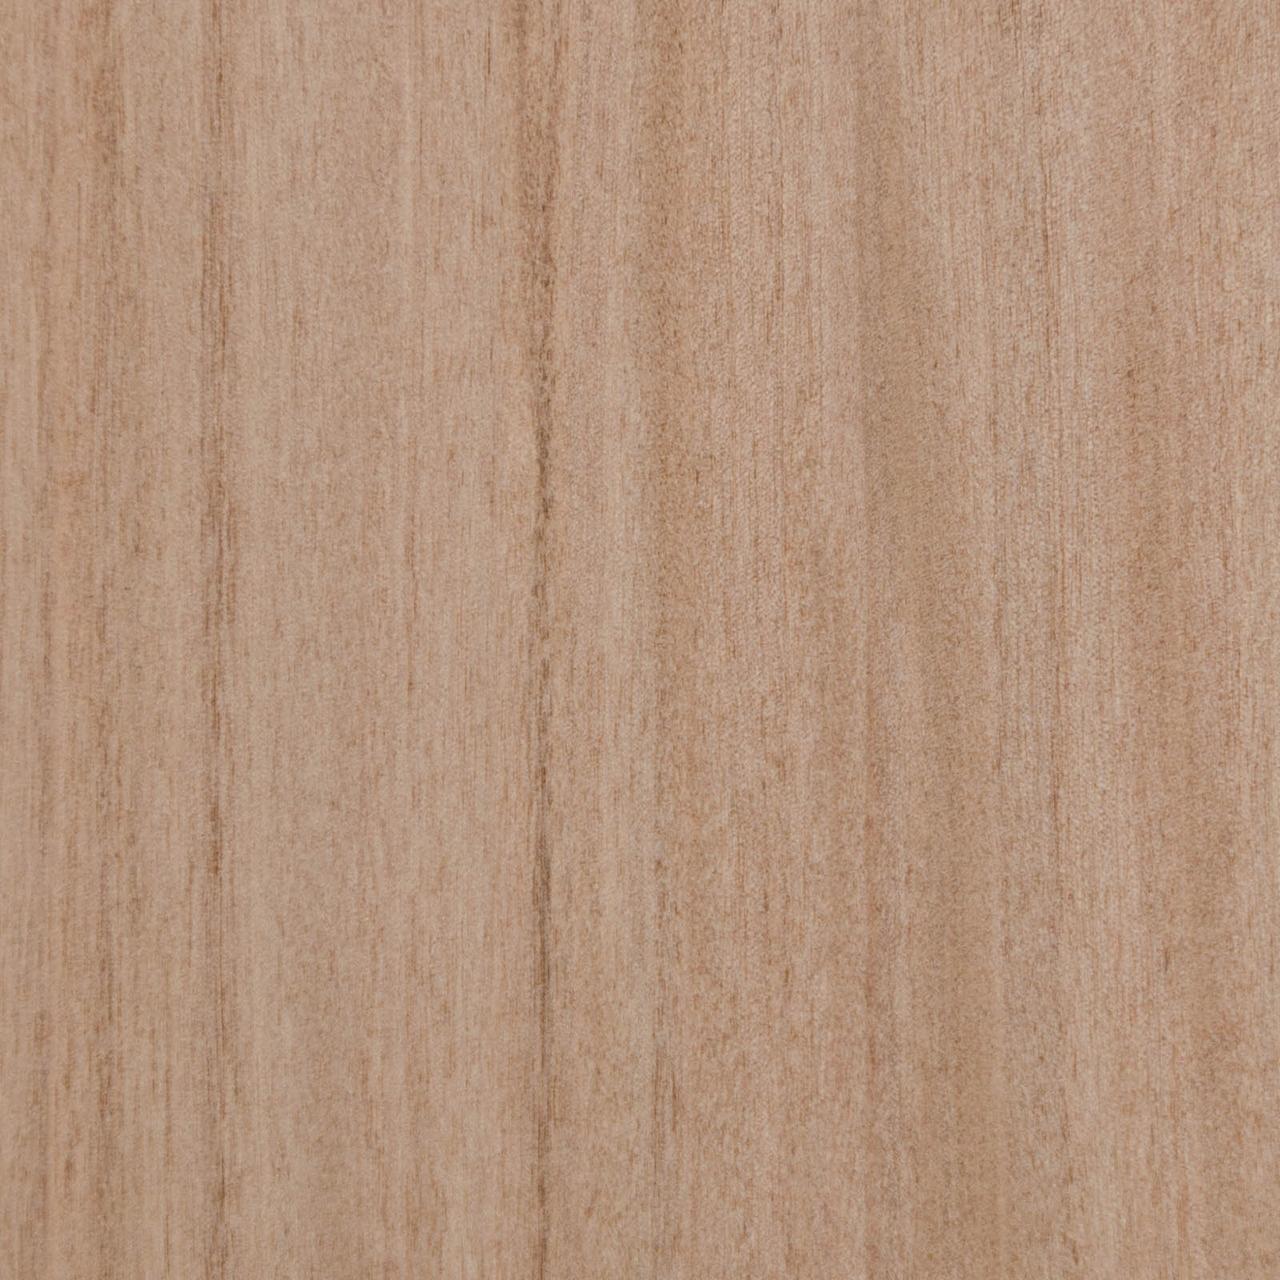 Brush Box 153cm x 13cm Wood Veneer   eBay